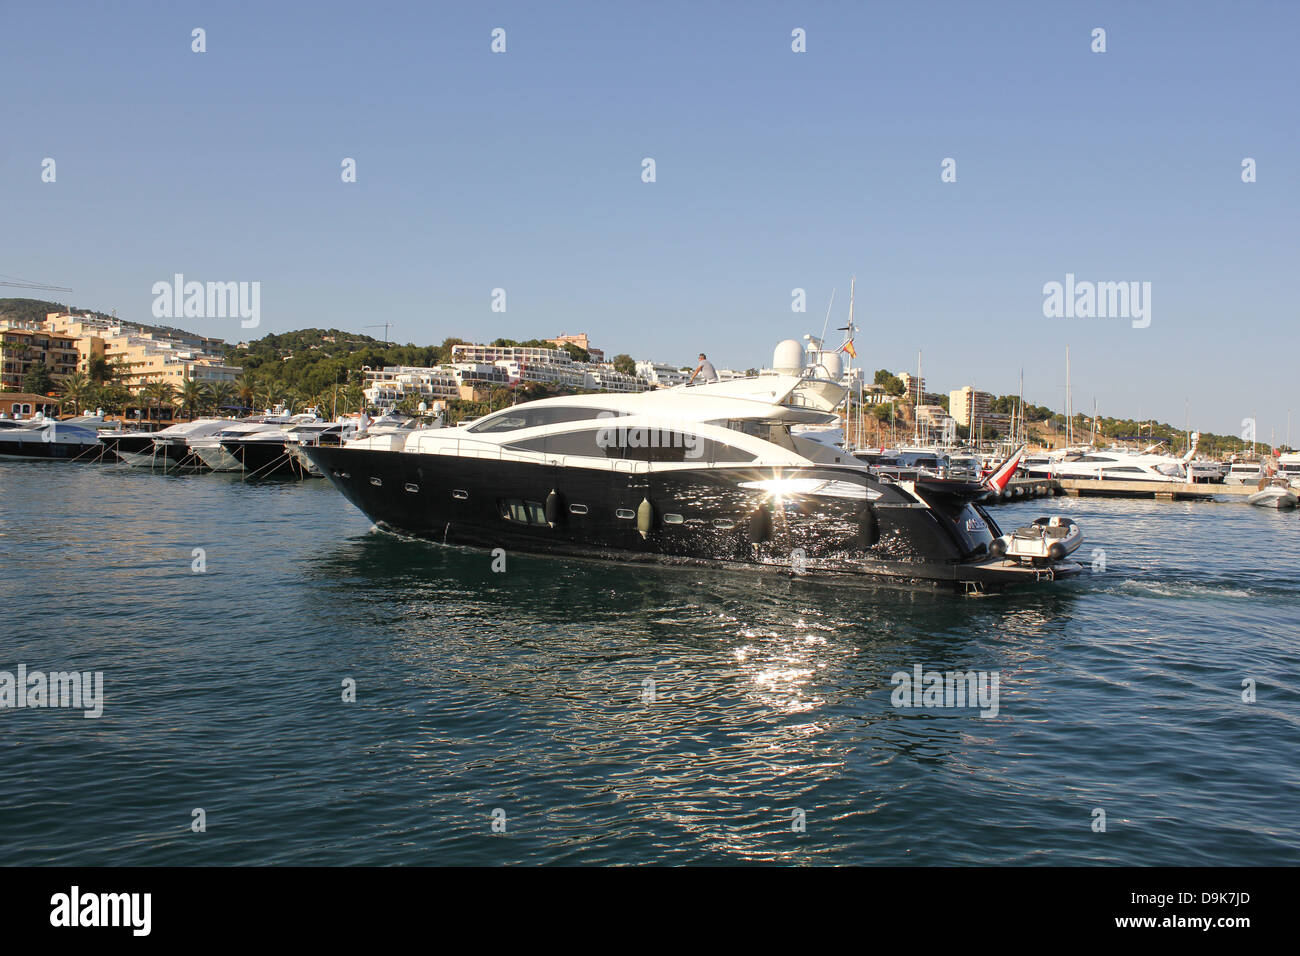 Luxury motor superyacht returning to berth - in Puerto Portals marina, Calvia, South West Mallorca / Majorca, Balearic - Stock Image